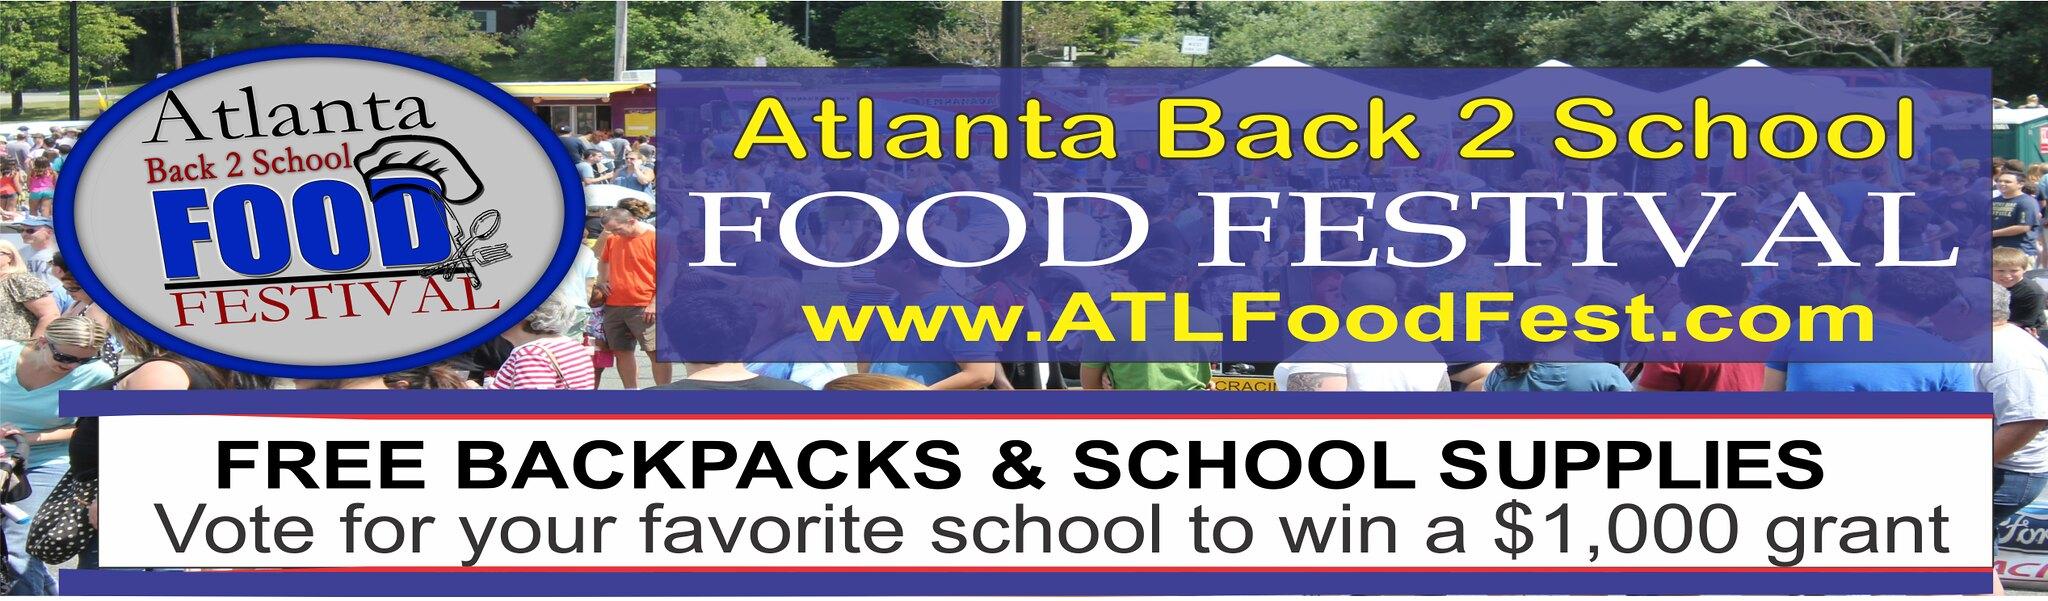 Atlantafoodfestival2016 (3)